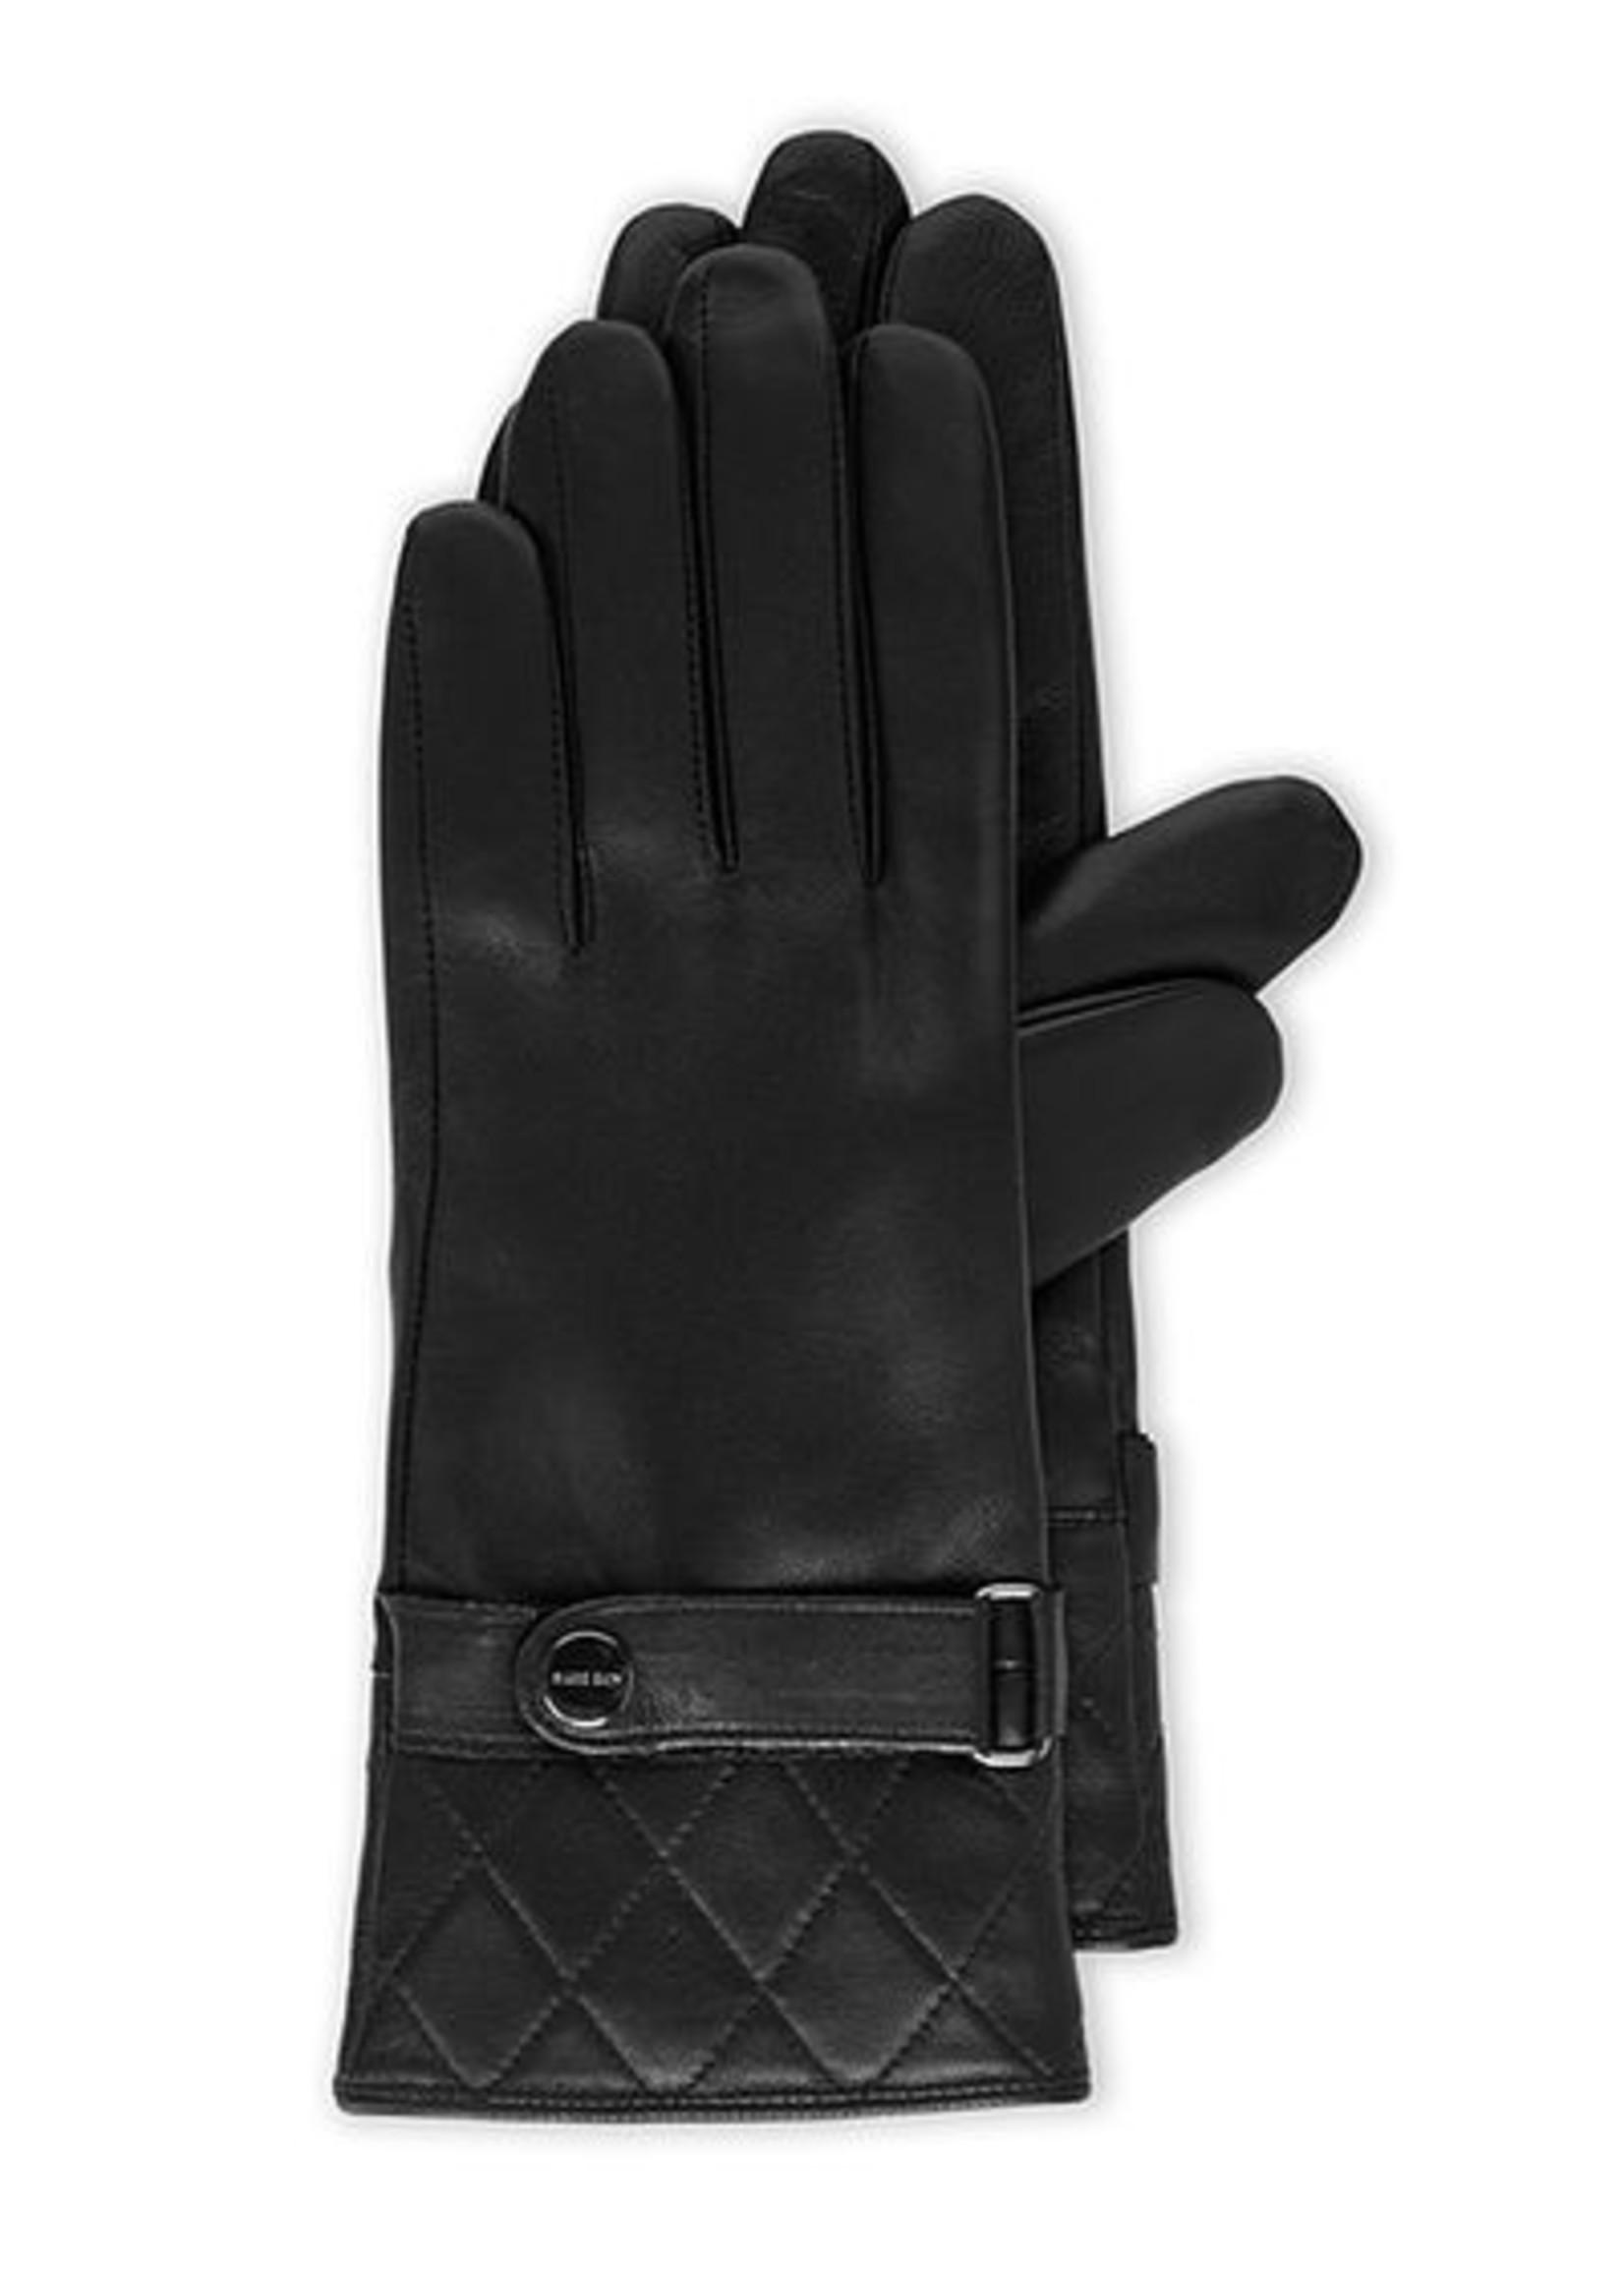 Handschoen RC F1.05 L86 black